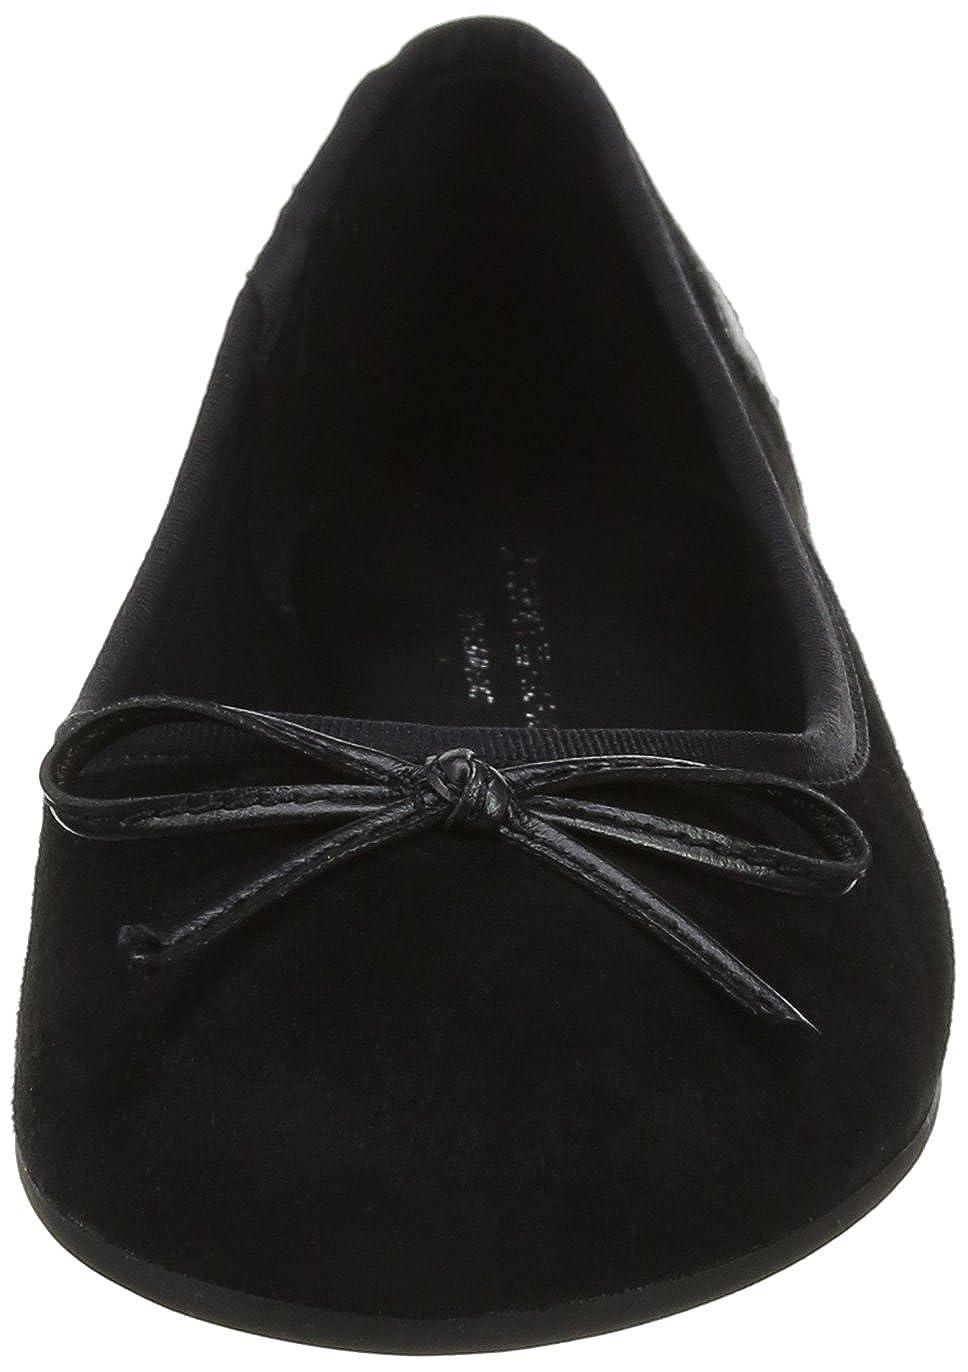 Tommy Hilfiger Geschlossene Damen Elevated Suede Ballerina Geschlossene Hilfiger Ballerinas Schwarz (schwarz 990) 5484d6